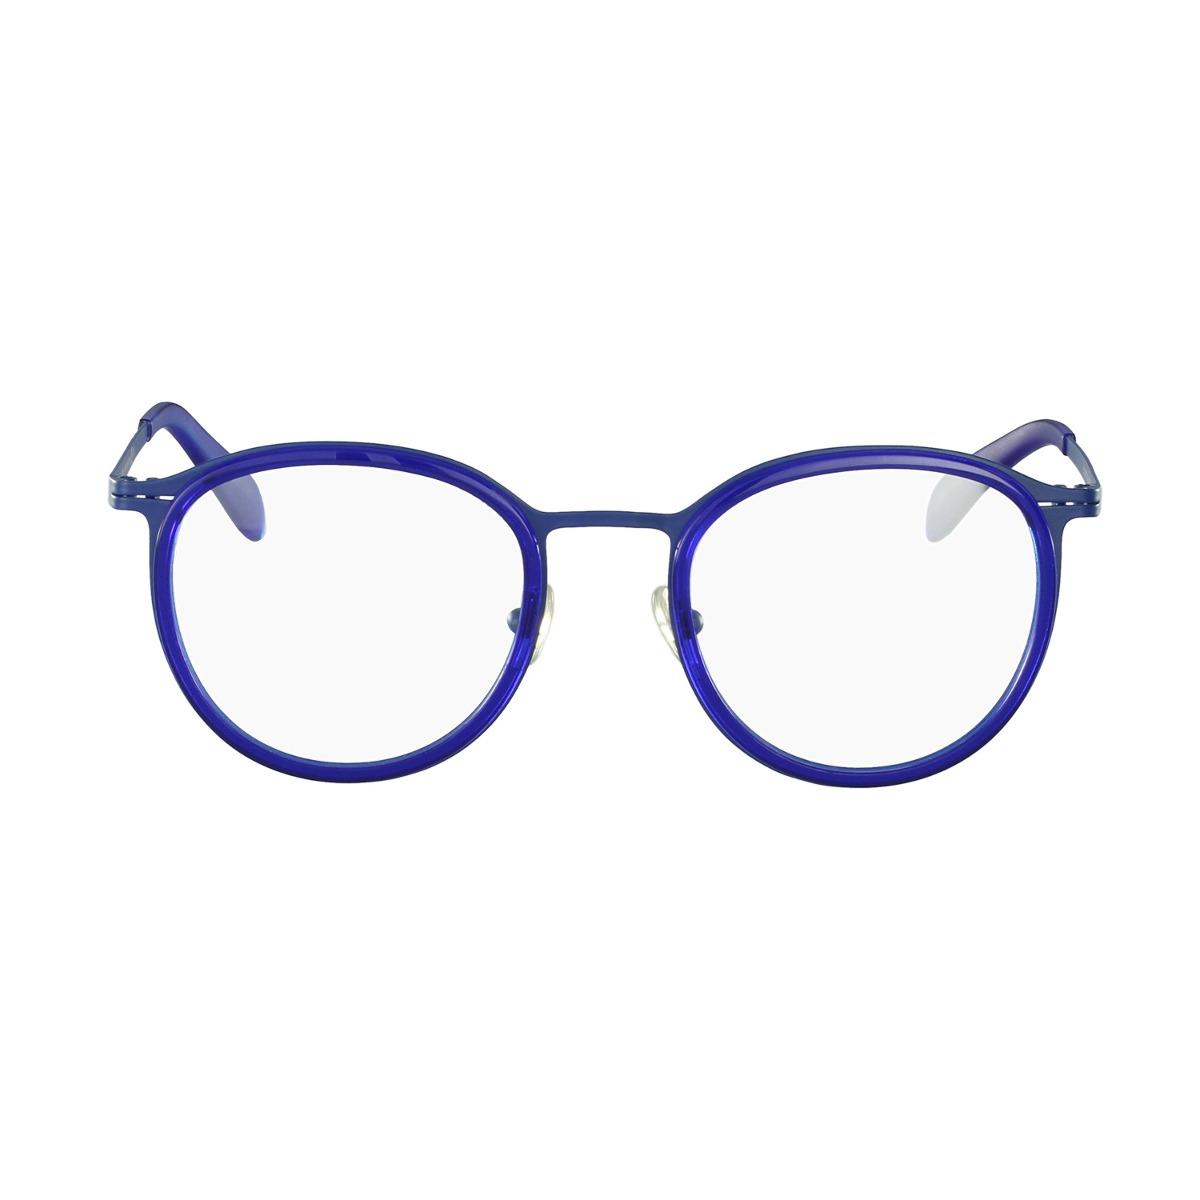 e71bdfed76ba5 Óculos De Grau Calvin Klein Fashion Azul 285714921502 - R  540